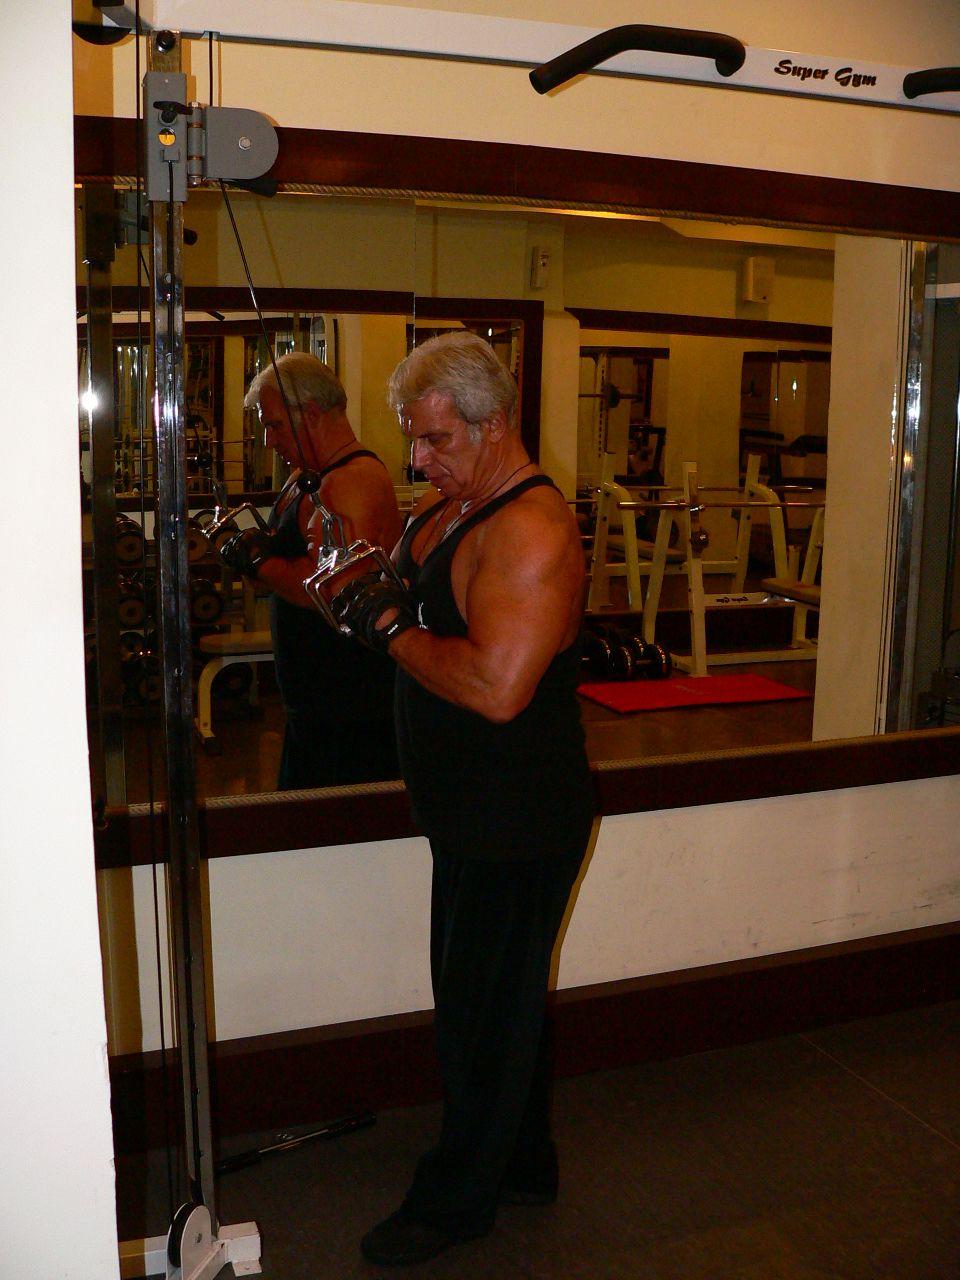 Triceps Push Down V-Bar Attachment